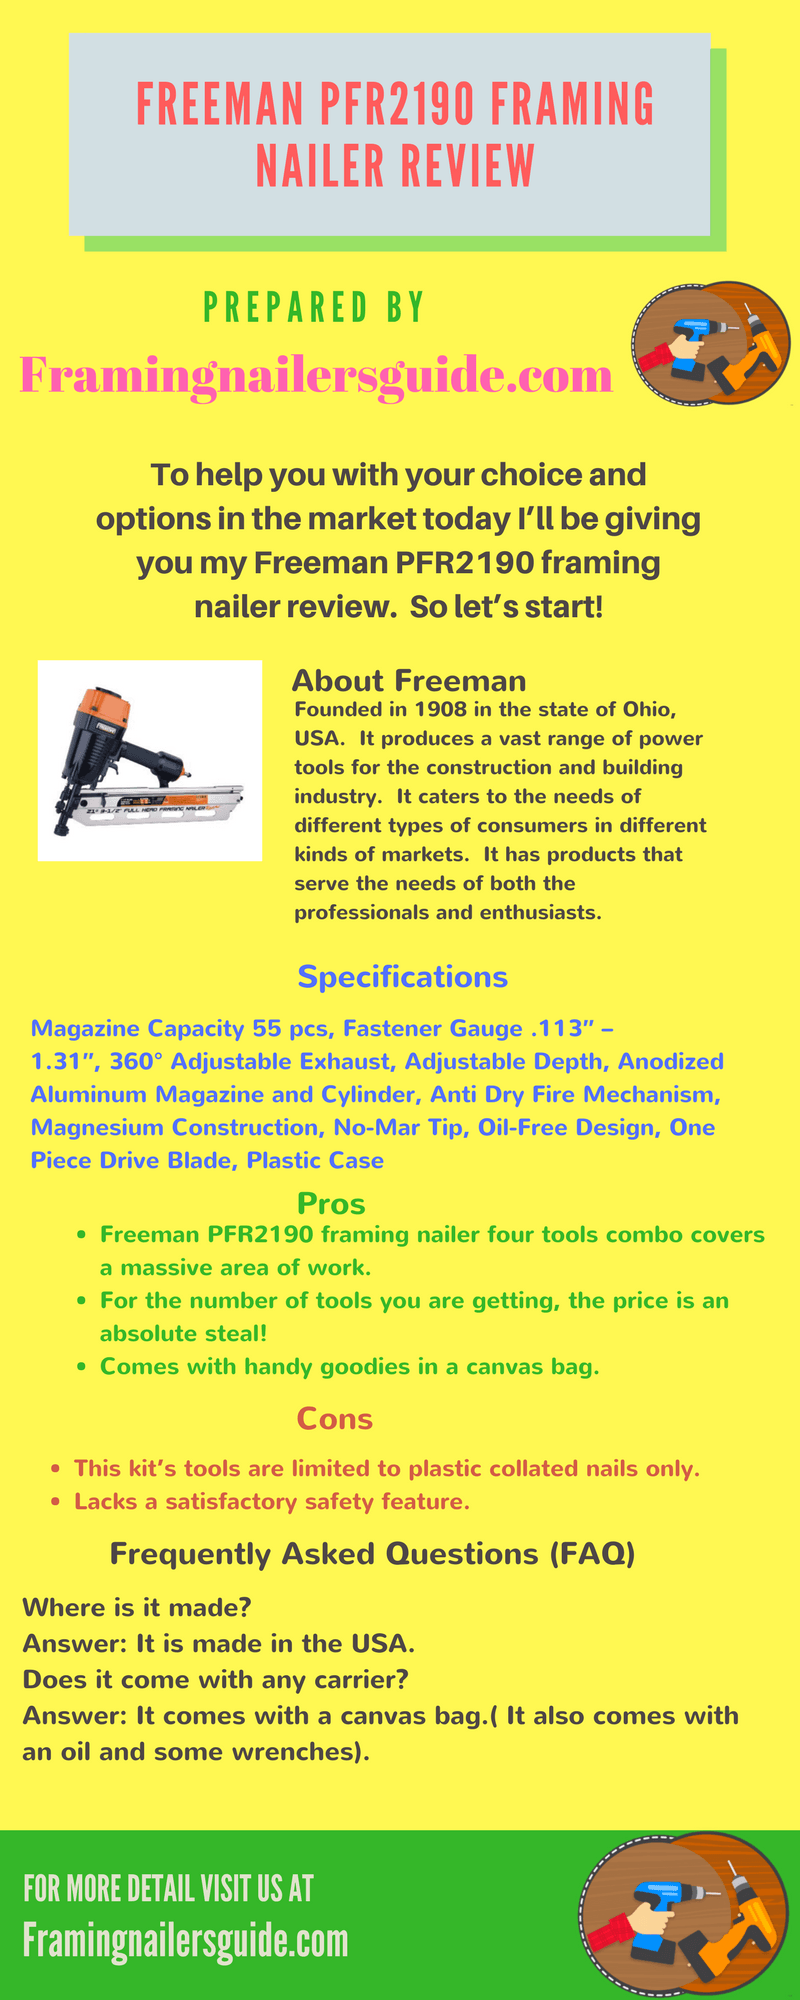 Freeman PFR2190 Framing Nailer Review   Buzz   Pinterest   Giveaway ...